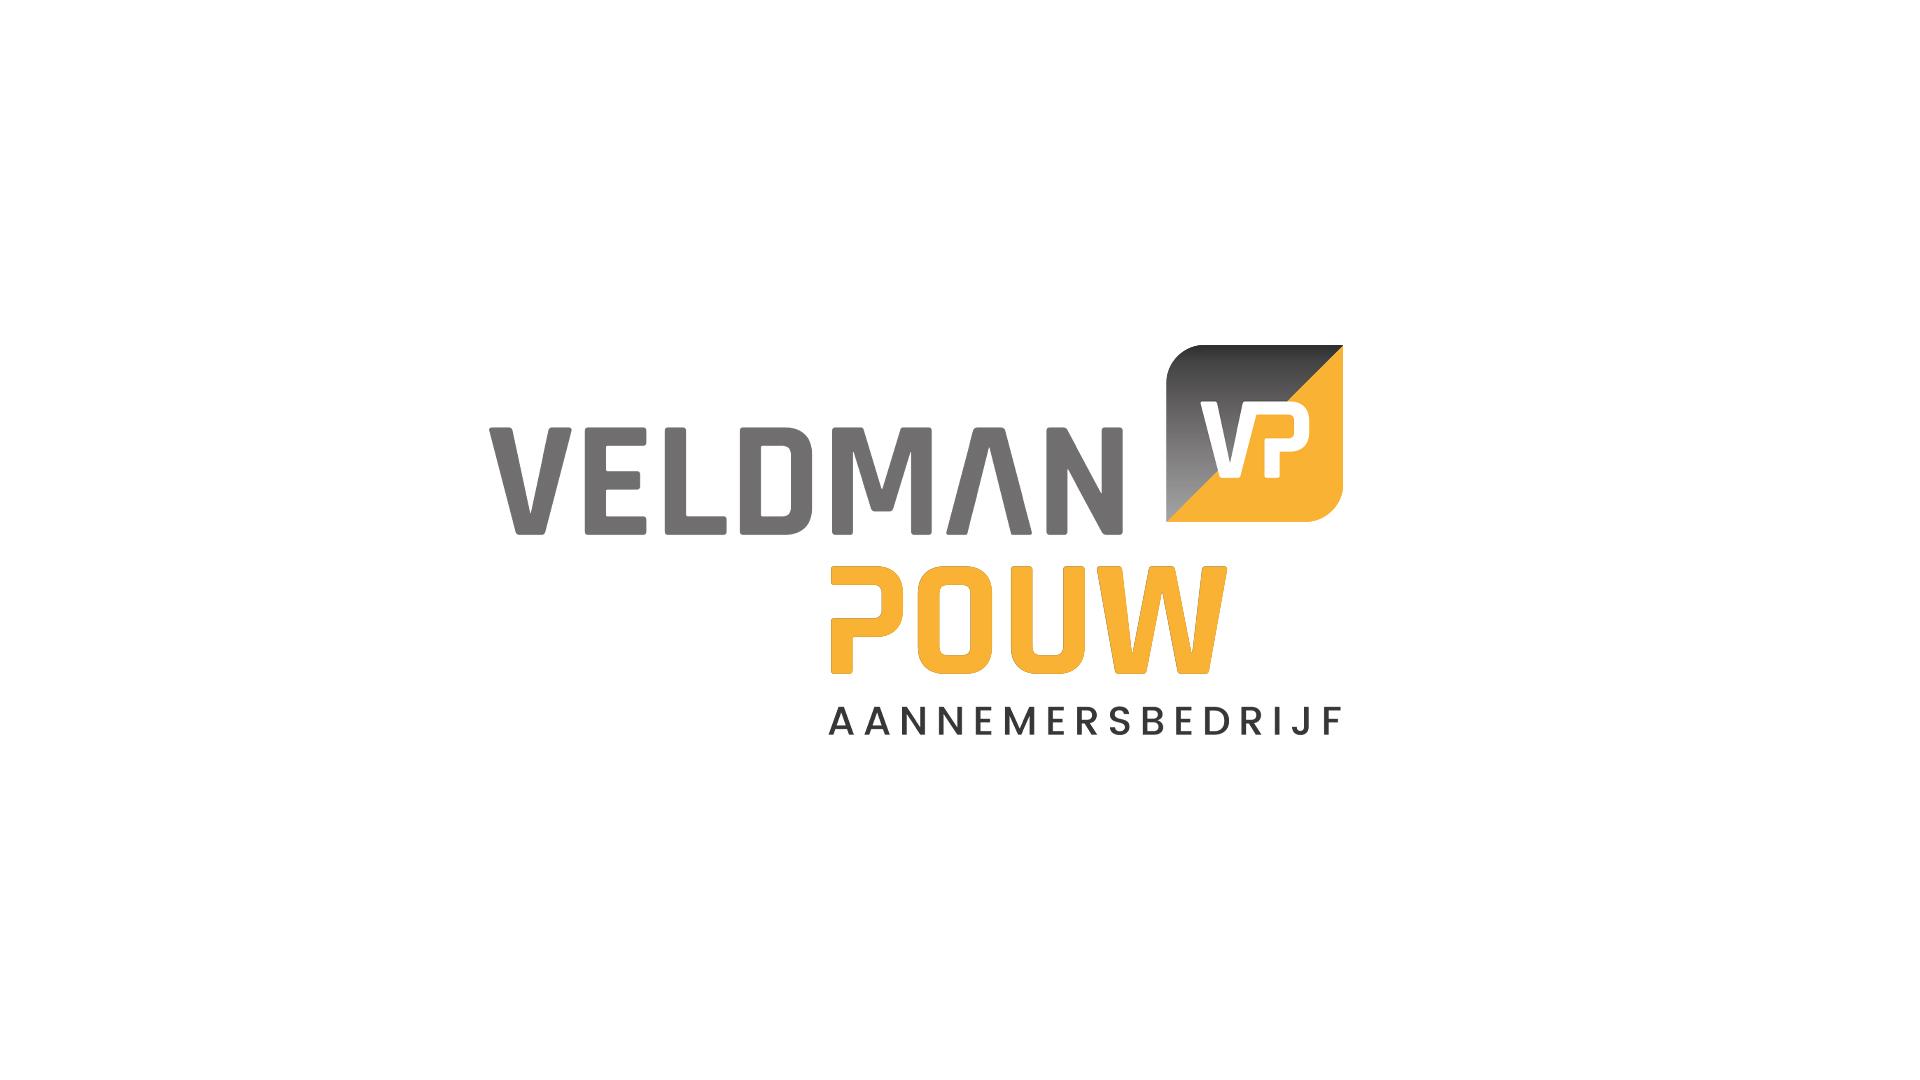 VeldmanPouw